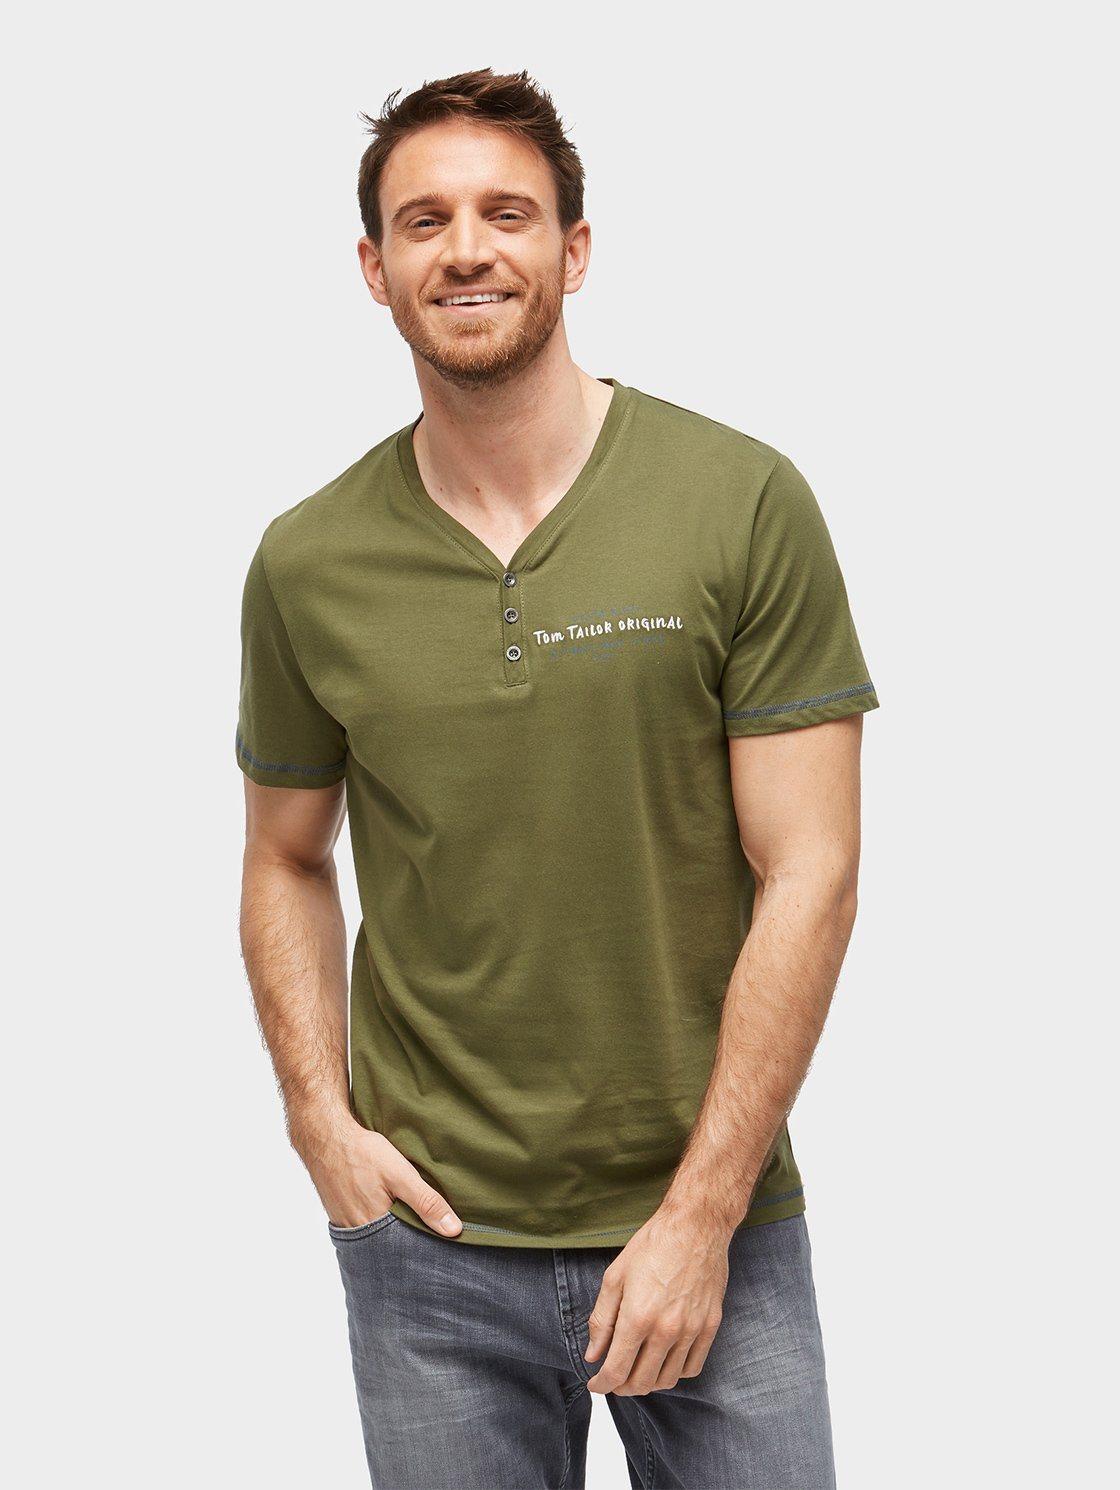 TOM TAILOR T-Shirt »T-Shirt mit Schrift-Stickerei« | Bekleidung > Shirts > Sonstige Shirts | TOM TAILOR